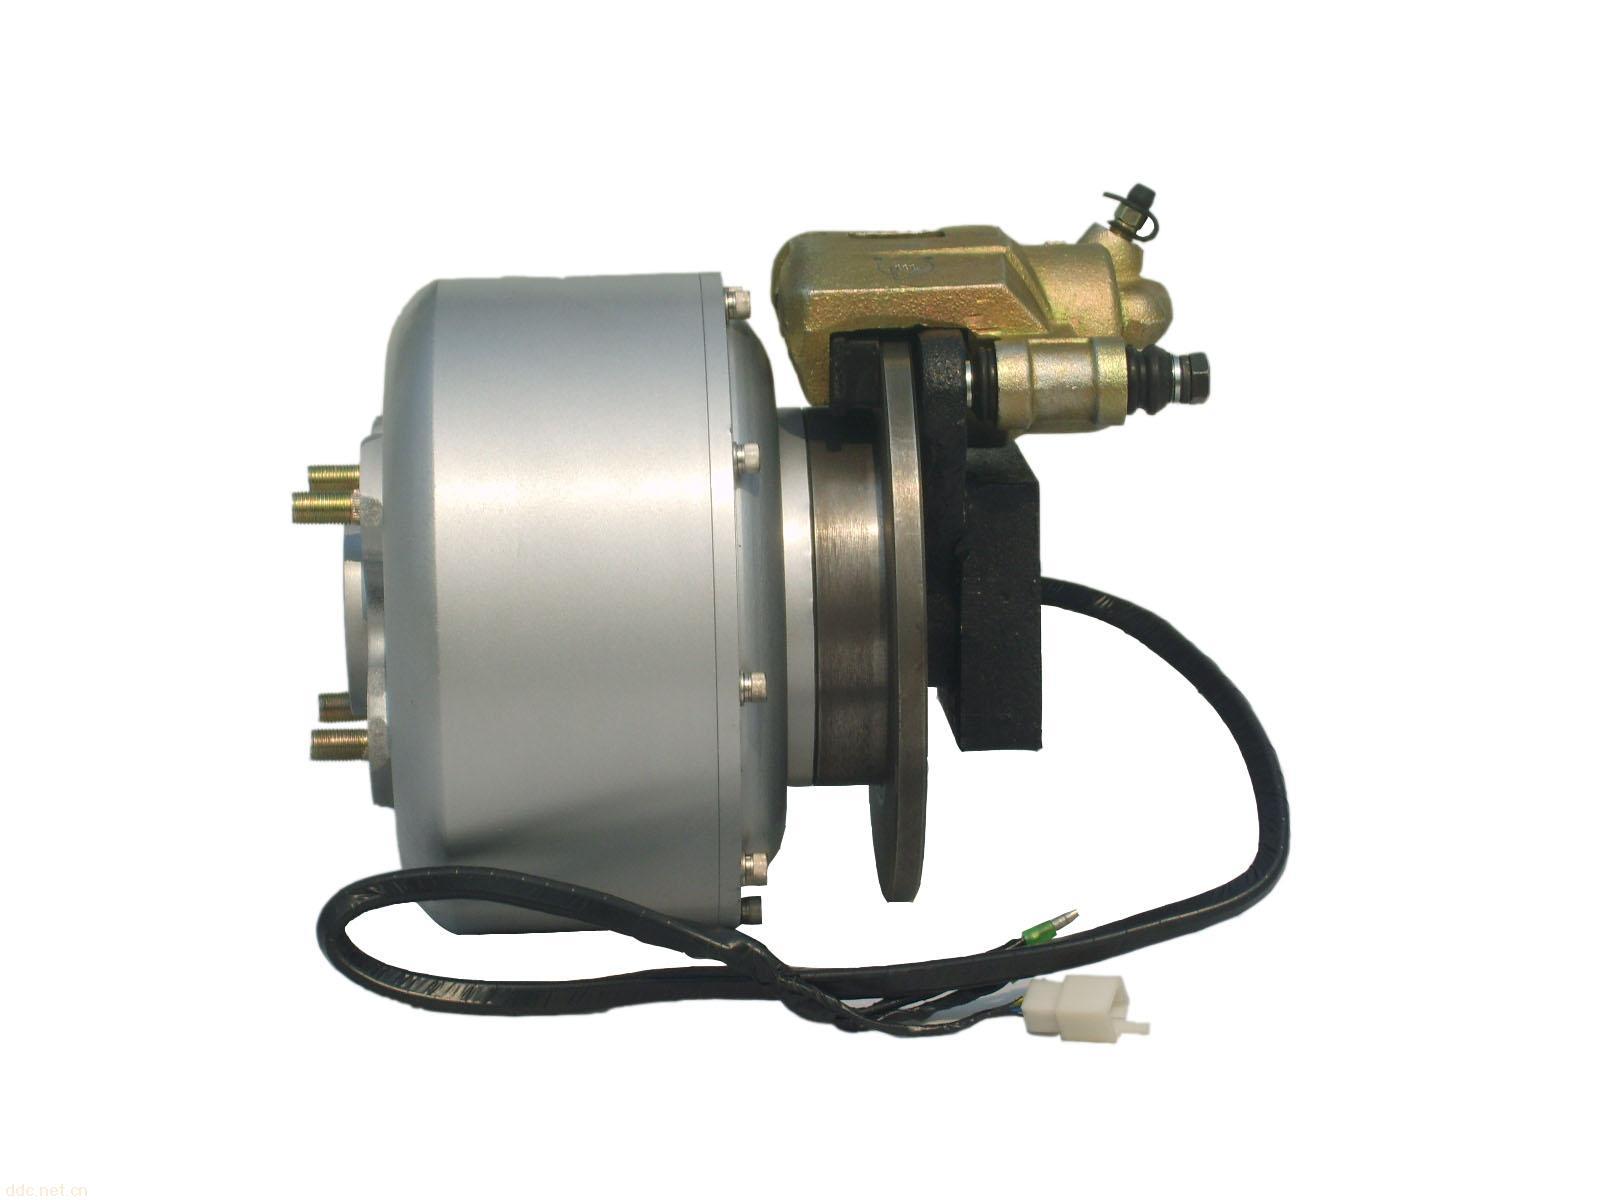 YT-297ZWG-2-5/72智能变挡永磁无刷中置电机是专为轻便型纯电动汽车及混合动力汽车而设计,具有转矩大、转速范围宽、智能变速等诸多特点,使用本电机作为动力,可以在不使用变速箱的情况下达到汽车行驶的动力指标,从而使得电动车的生产和制造更方便,成本更节约。 YT-297ZWG-2-5/72智能变挡永磁无刷中置电机具有3C认证,参数符合国标GB/T21418的规定,安全可靠。 产品参数: 项目: 一挡 二挡 额定电压: 72V 额定功率 3.